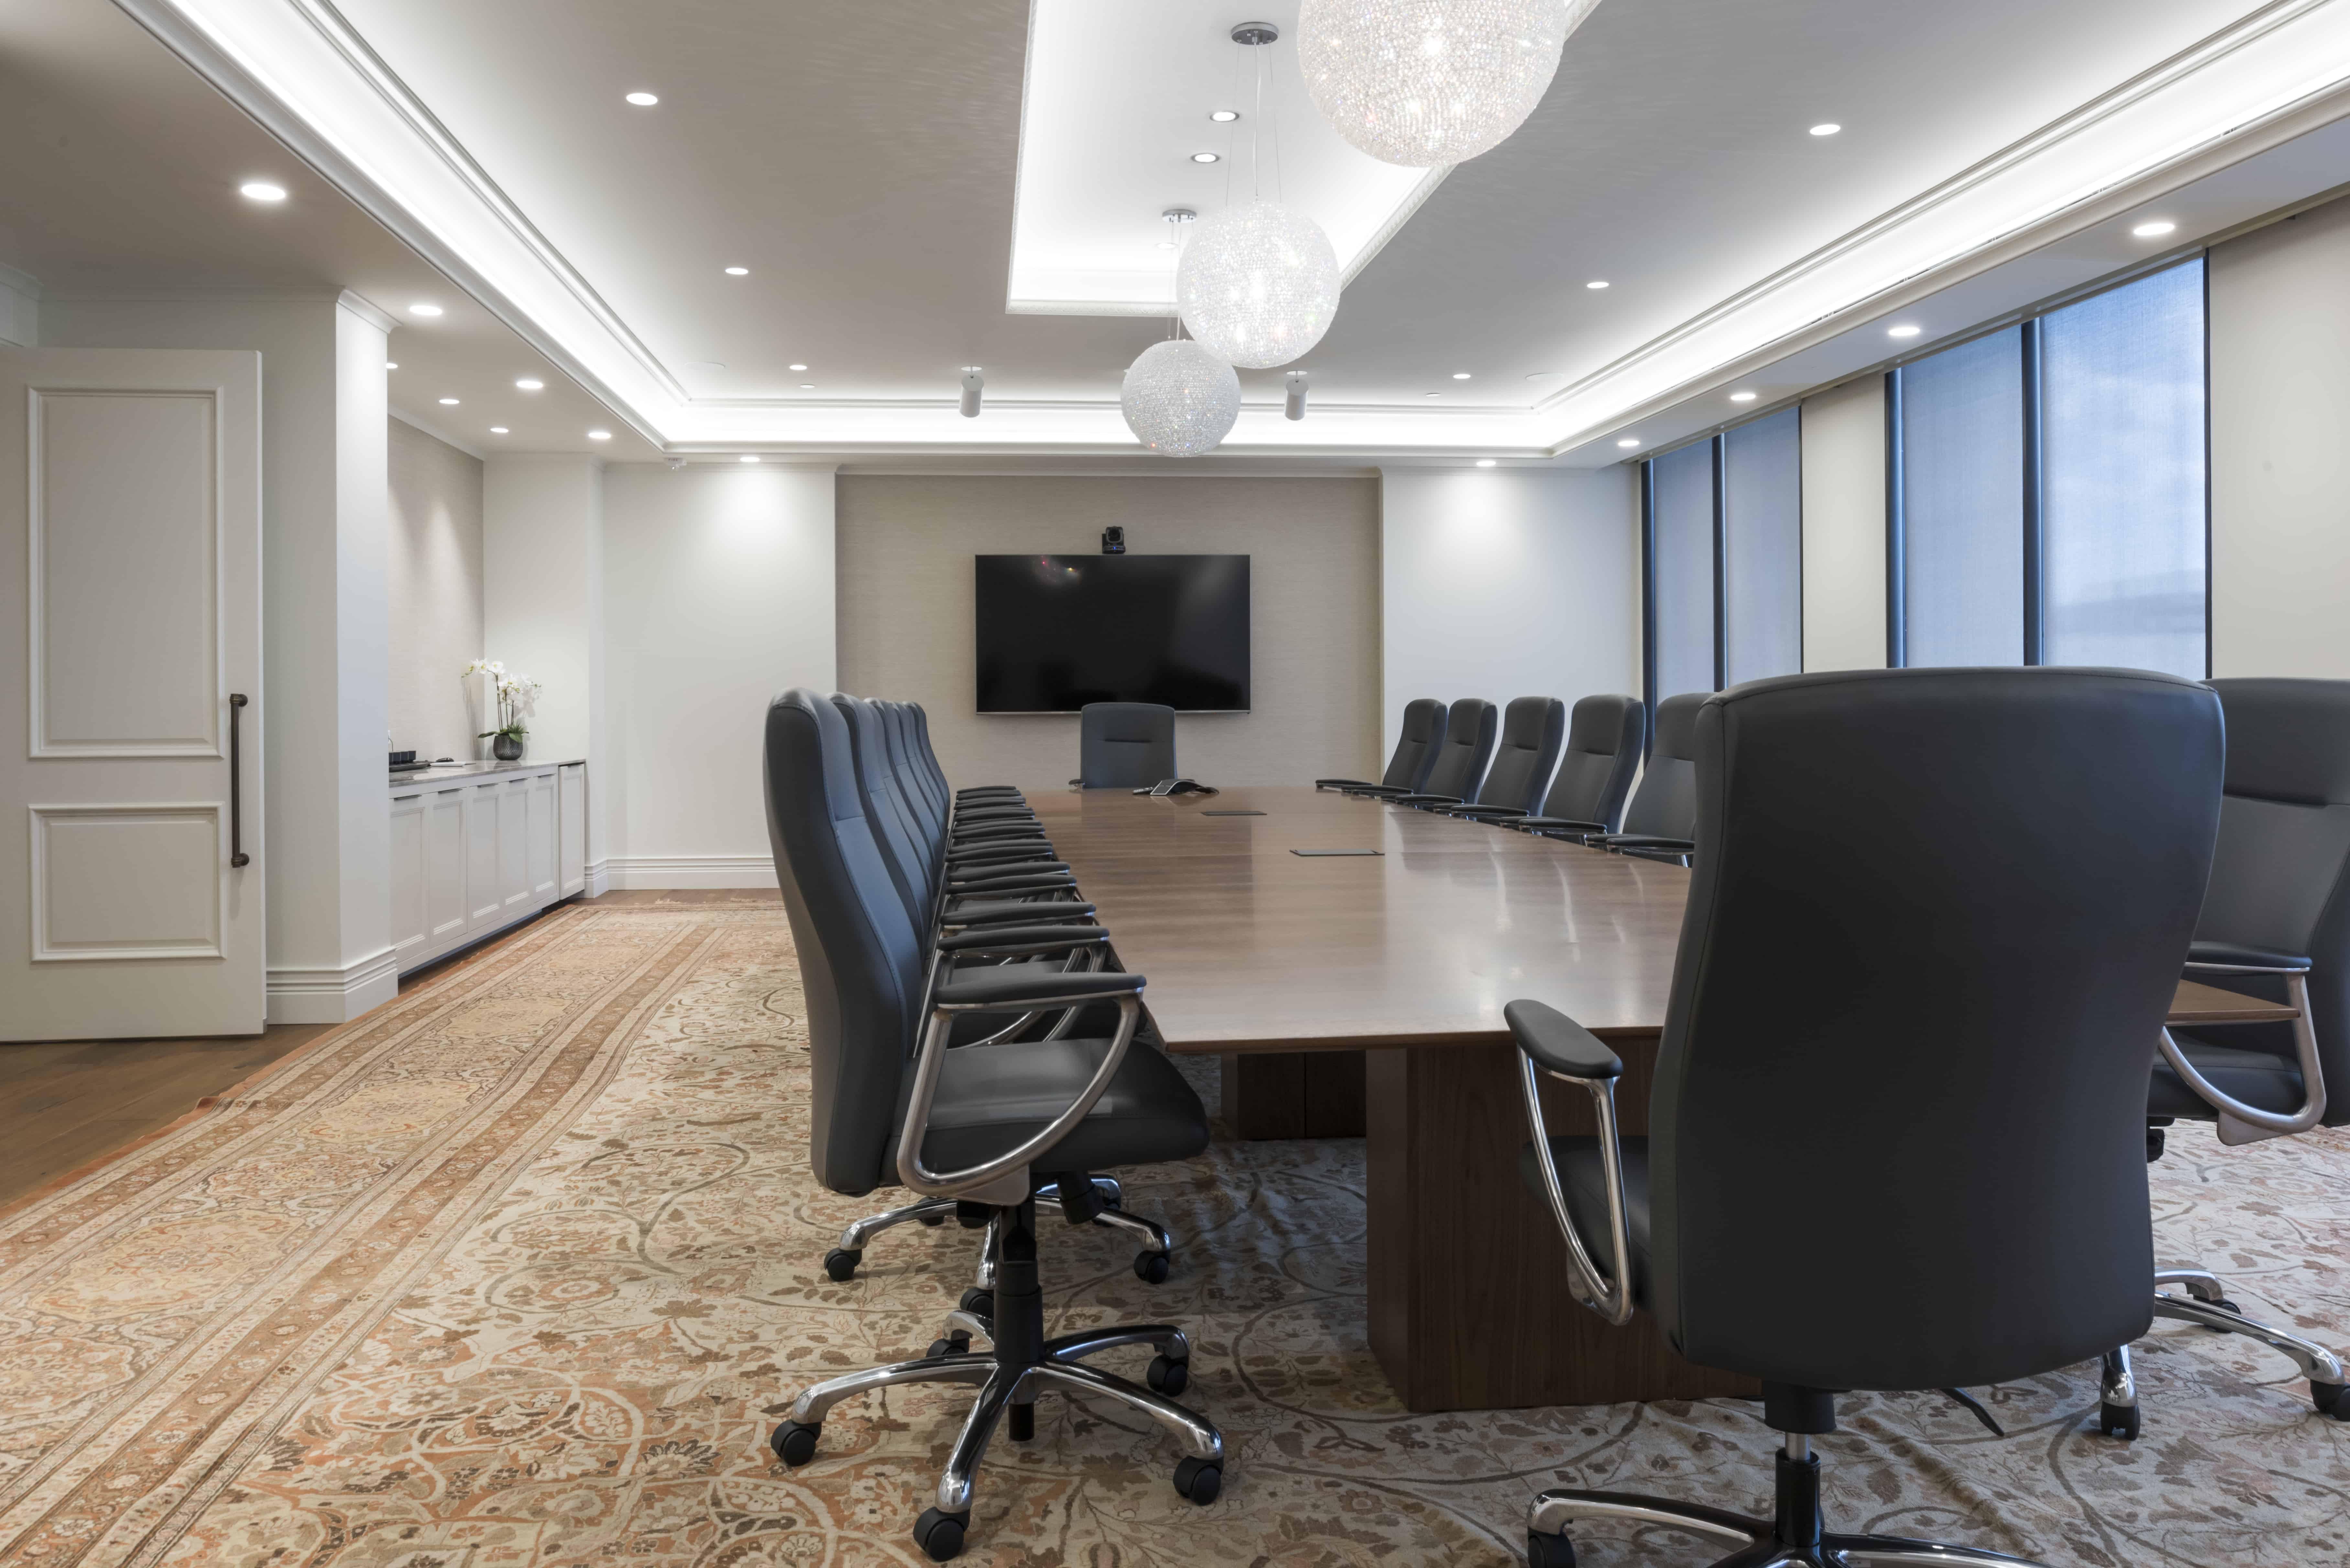 Greenway Plaza Corporate Interiors